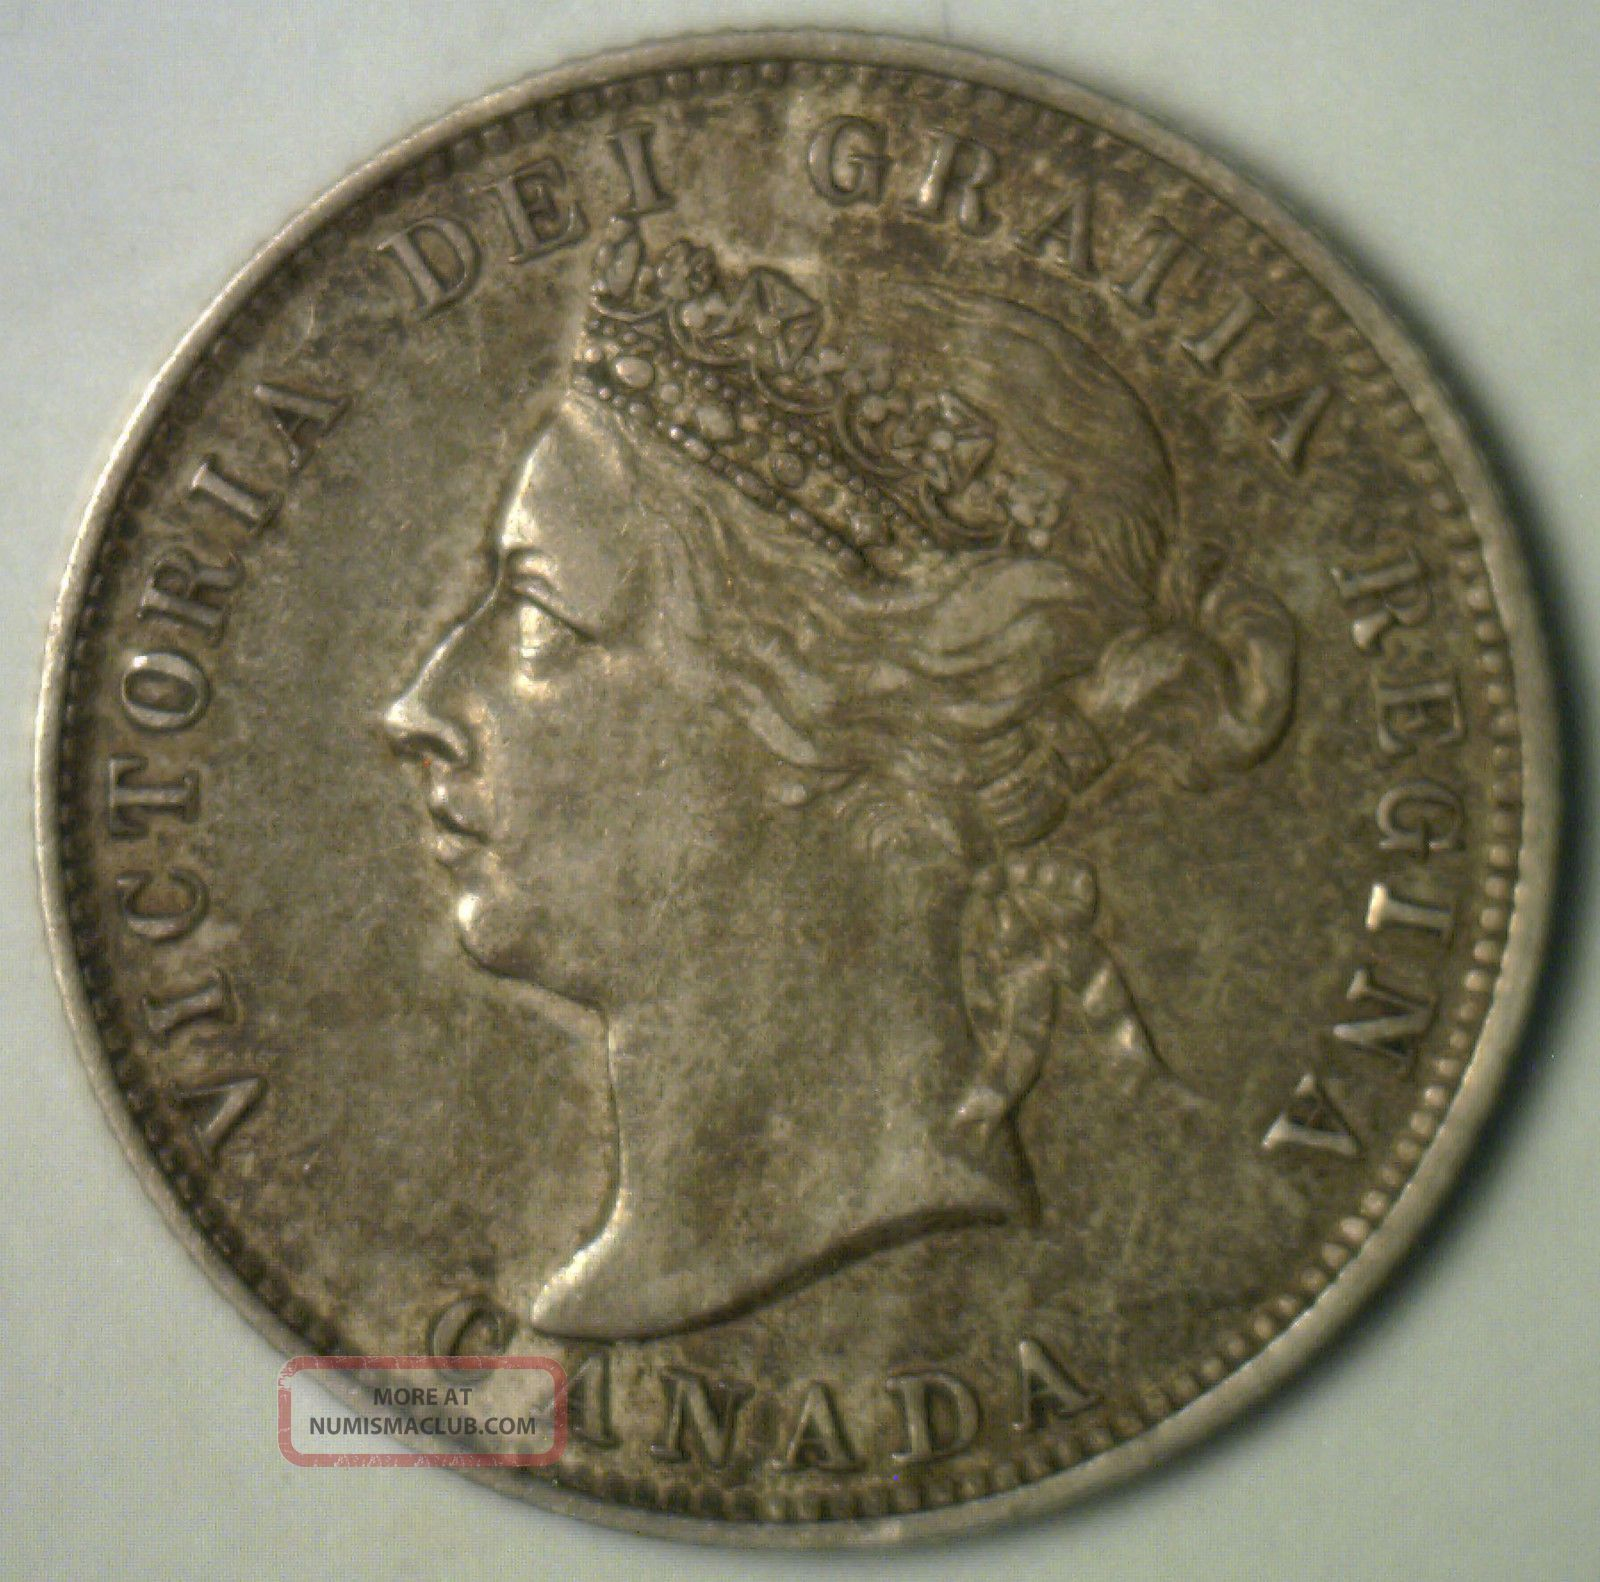 1892 Canadian Silver 25 Cent Quarter Coin Victoria Canada Extra Fine Xf